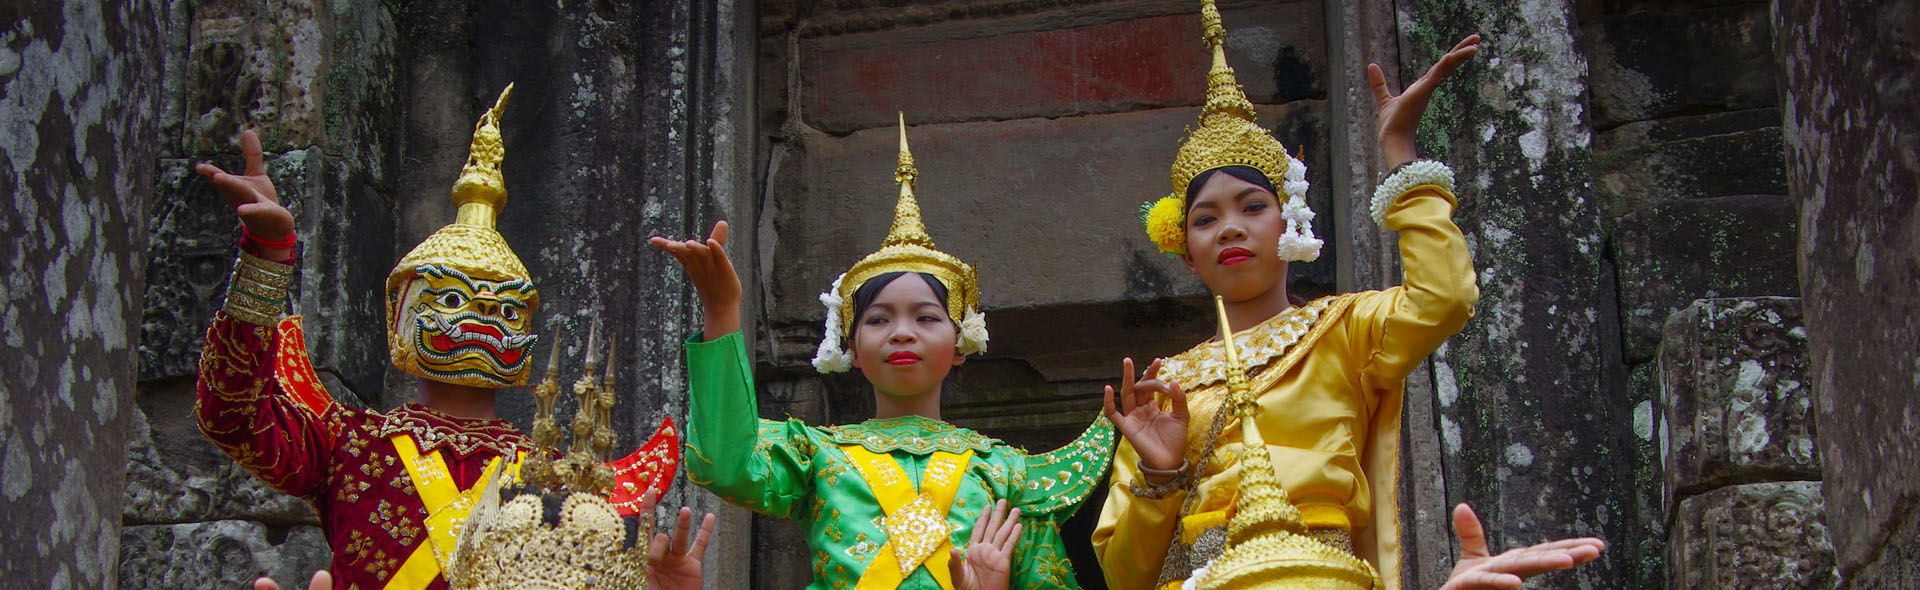 Kambodscha, Land der Tempelstädte